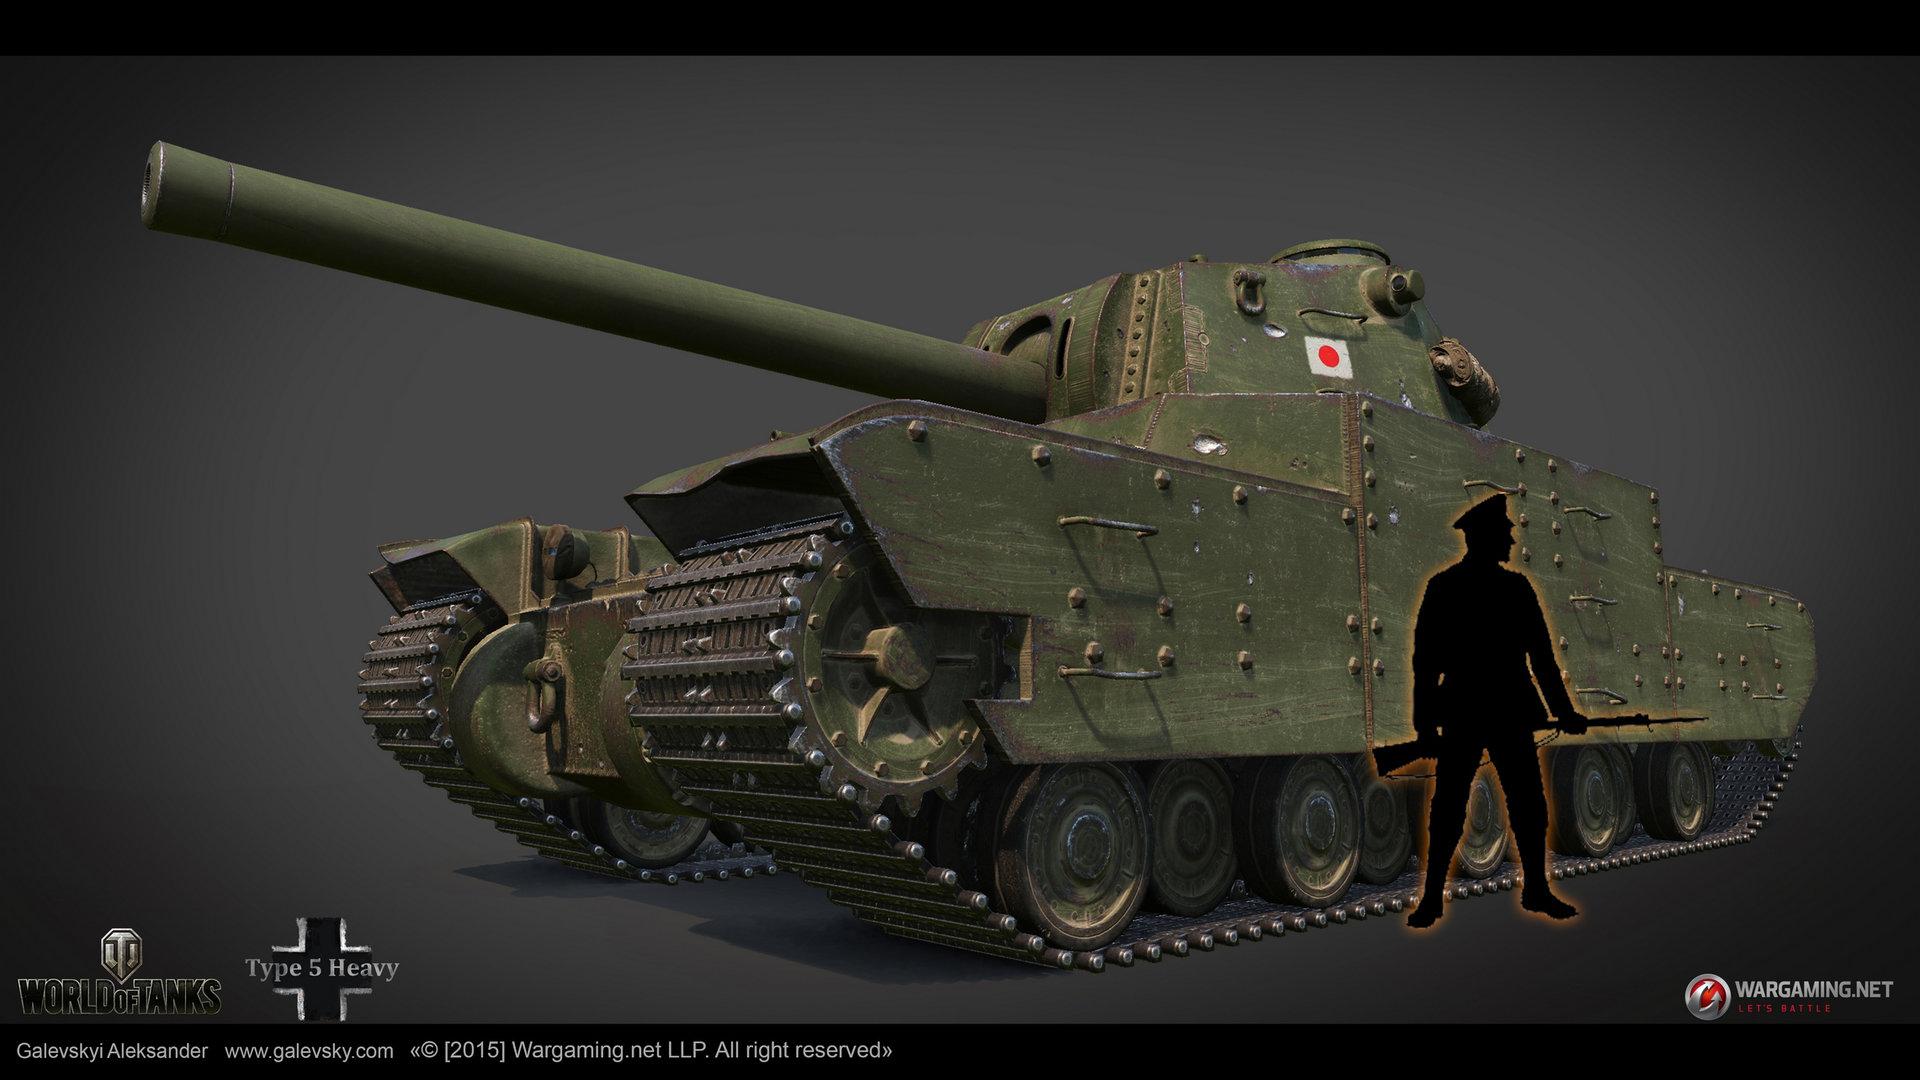 Aleksander galevskyi type 2605 fin 01 med